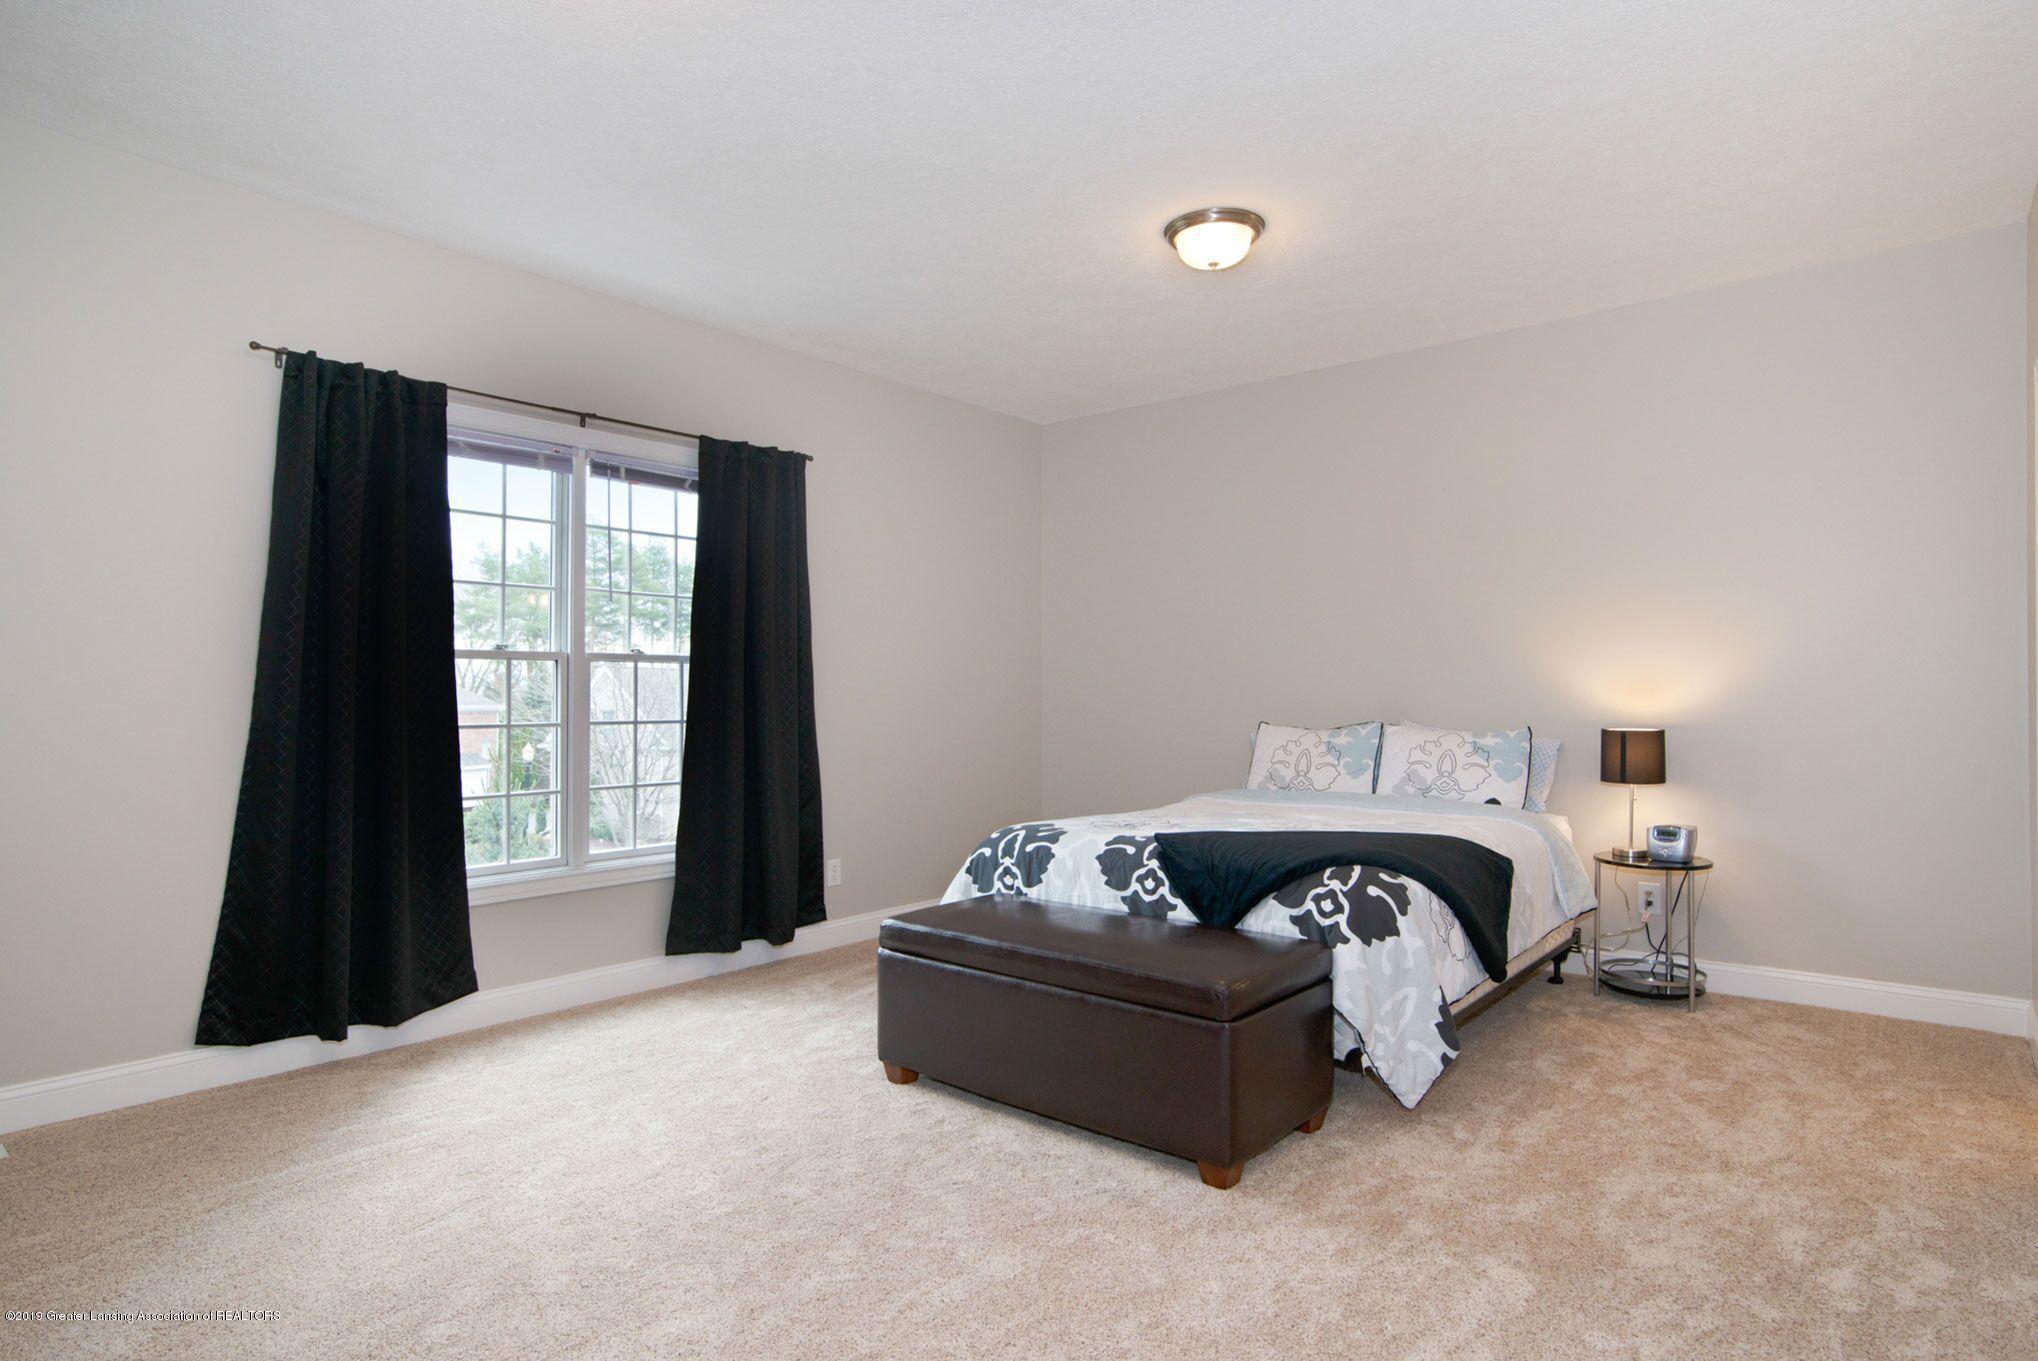 6389 Ridgepond Dr - Bedroom 4 1 - 29